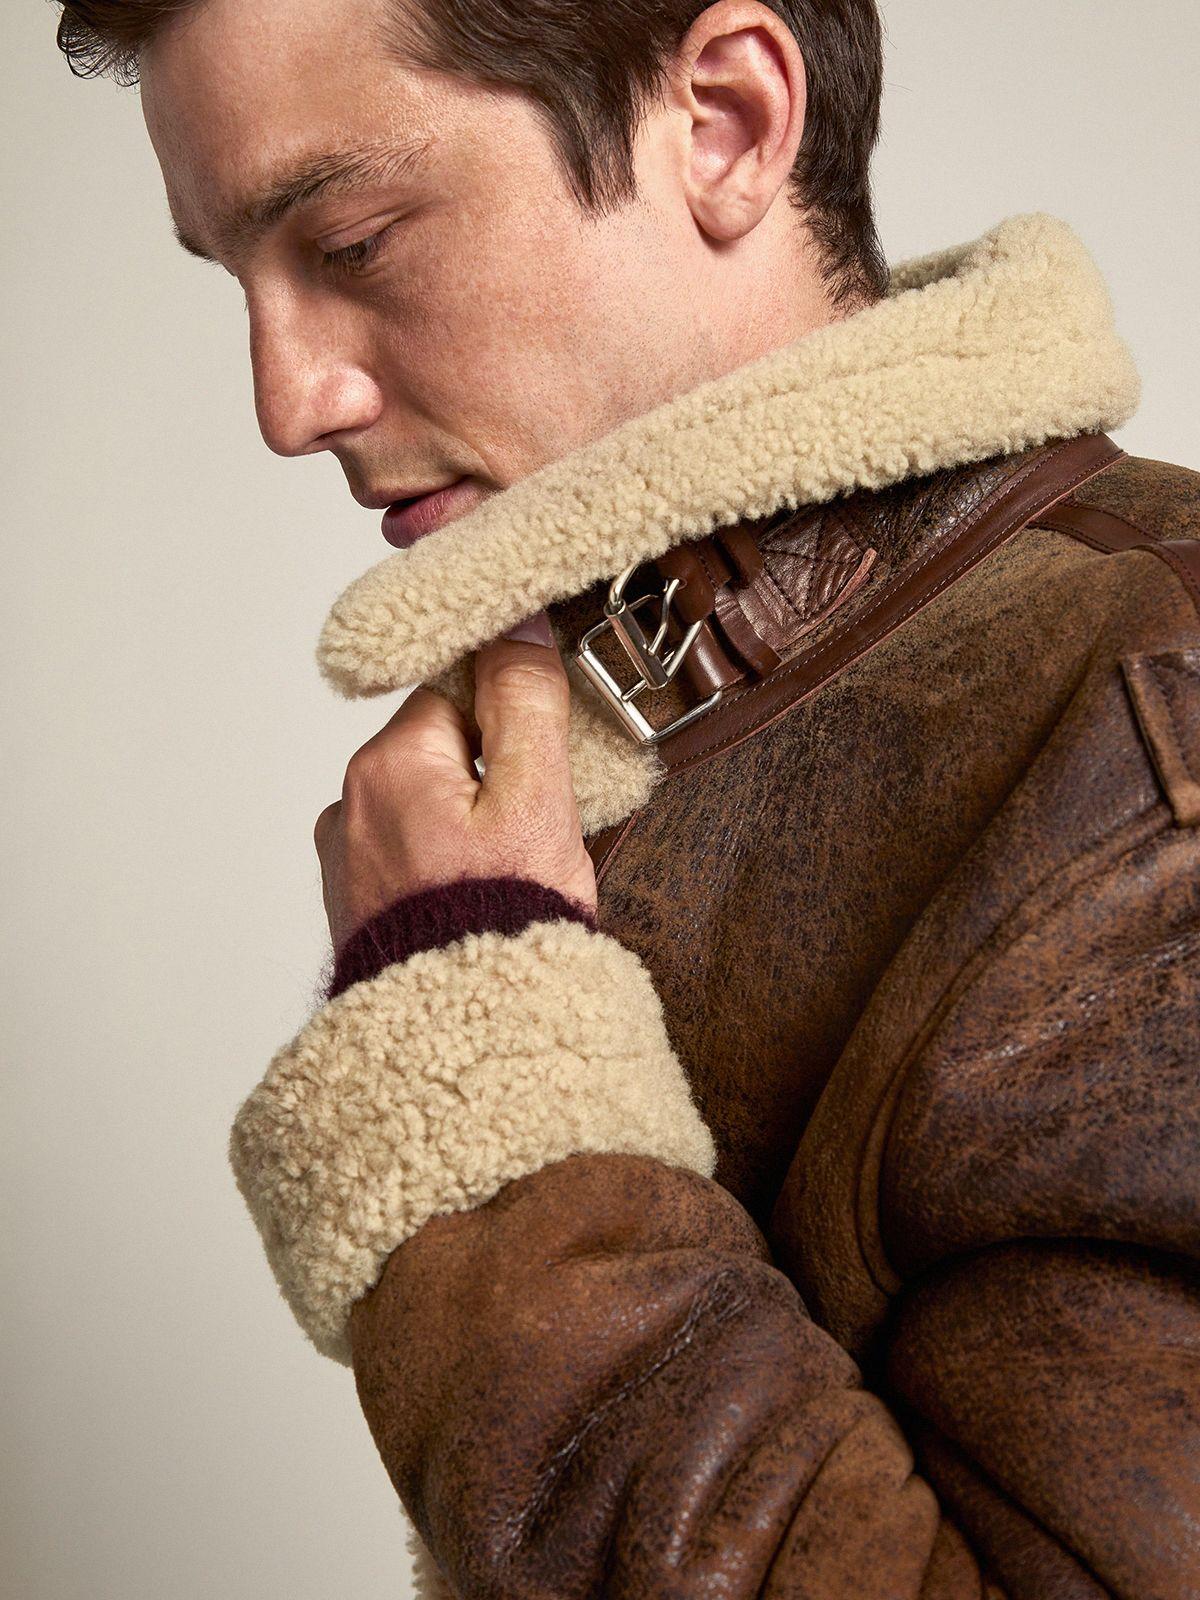 Golden Goose - Arvel sheepskin jacket with shearling interior in